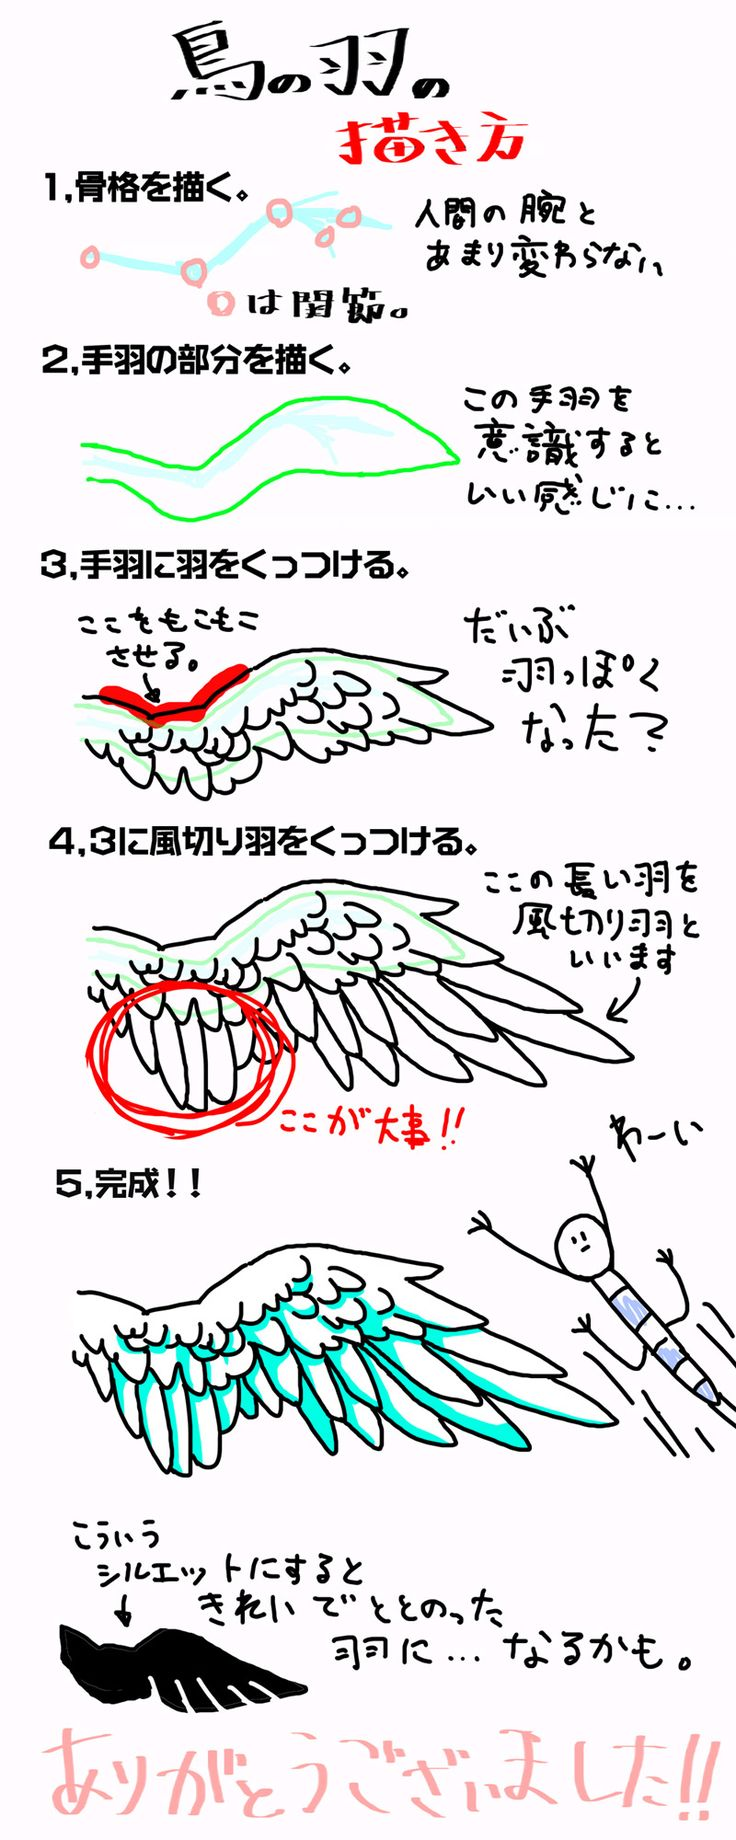 【講座】簡単鳥の羽の描き方 | 摩訶不思議日本